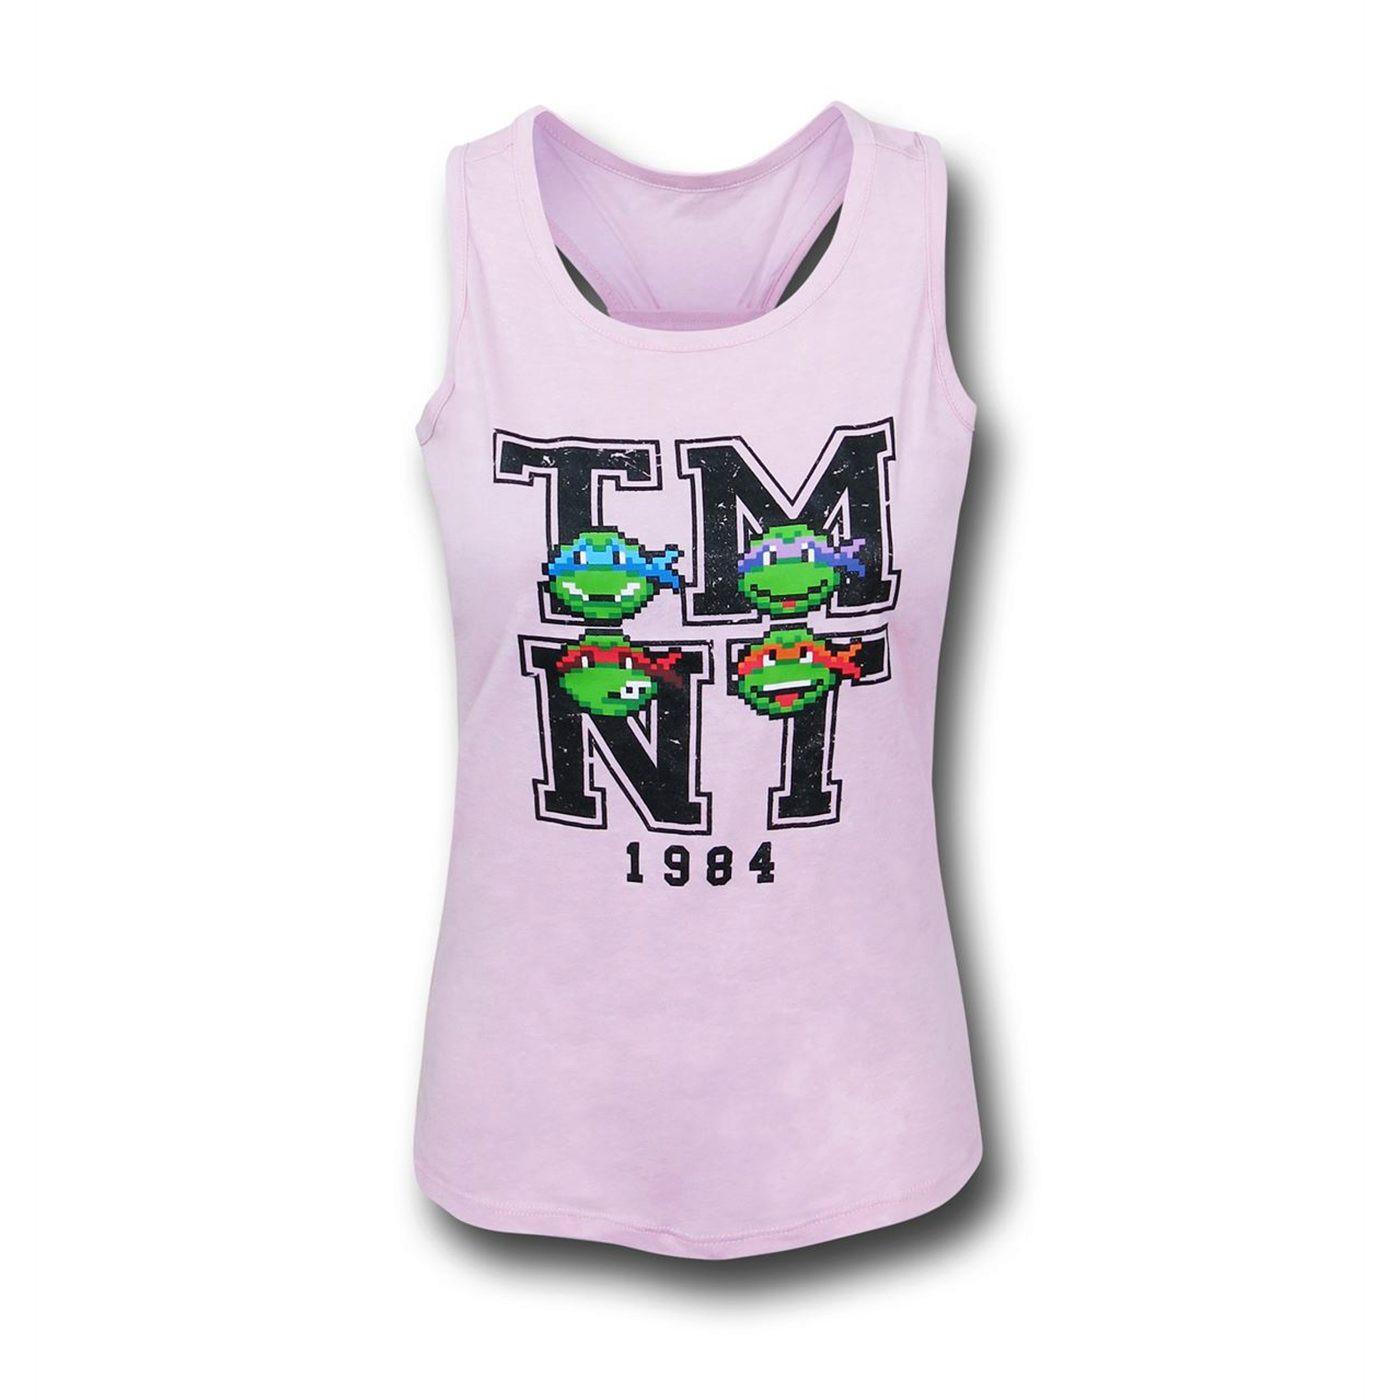 TMNT Heads Girls Youth Tank Top